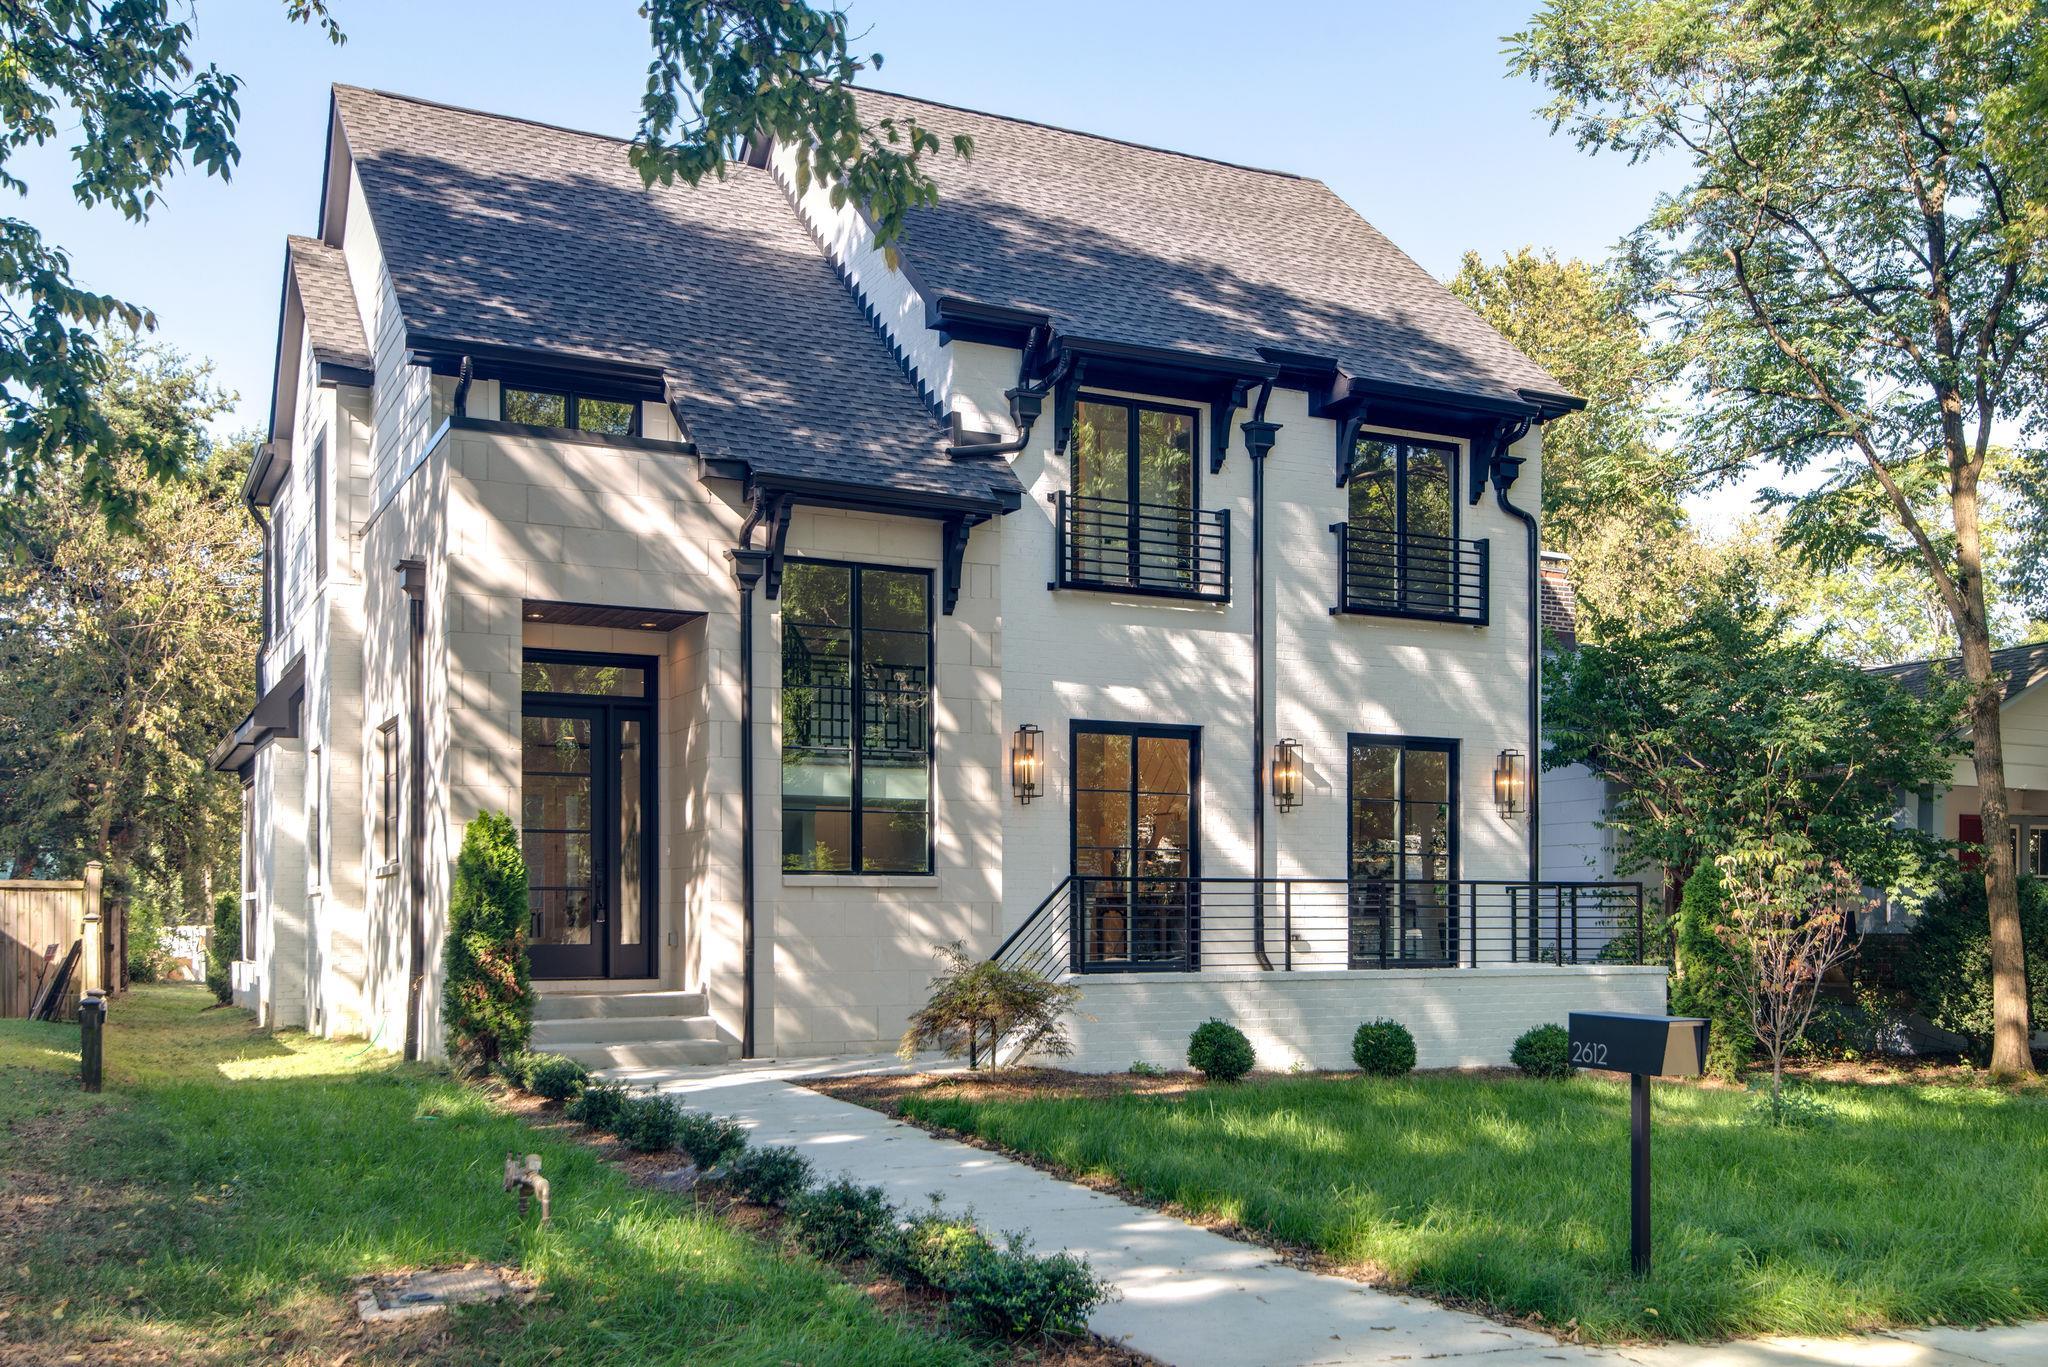 2612 Belcourt Ave, Nashville, TN 37212 - Nashville, TN real estate listing